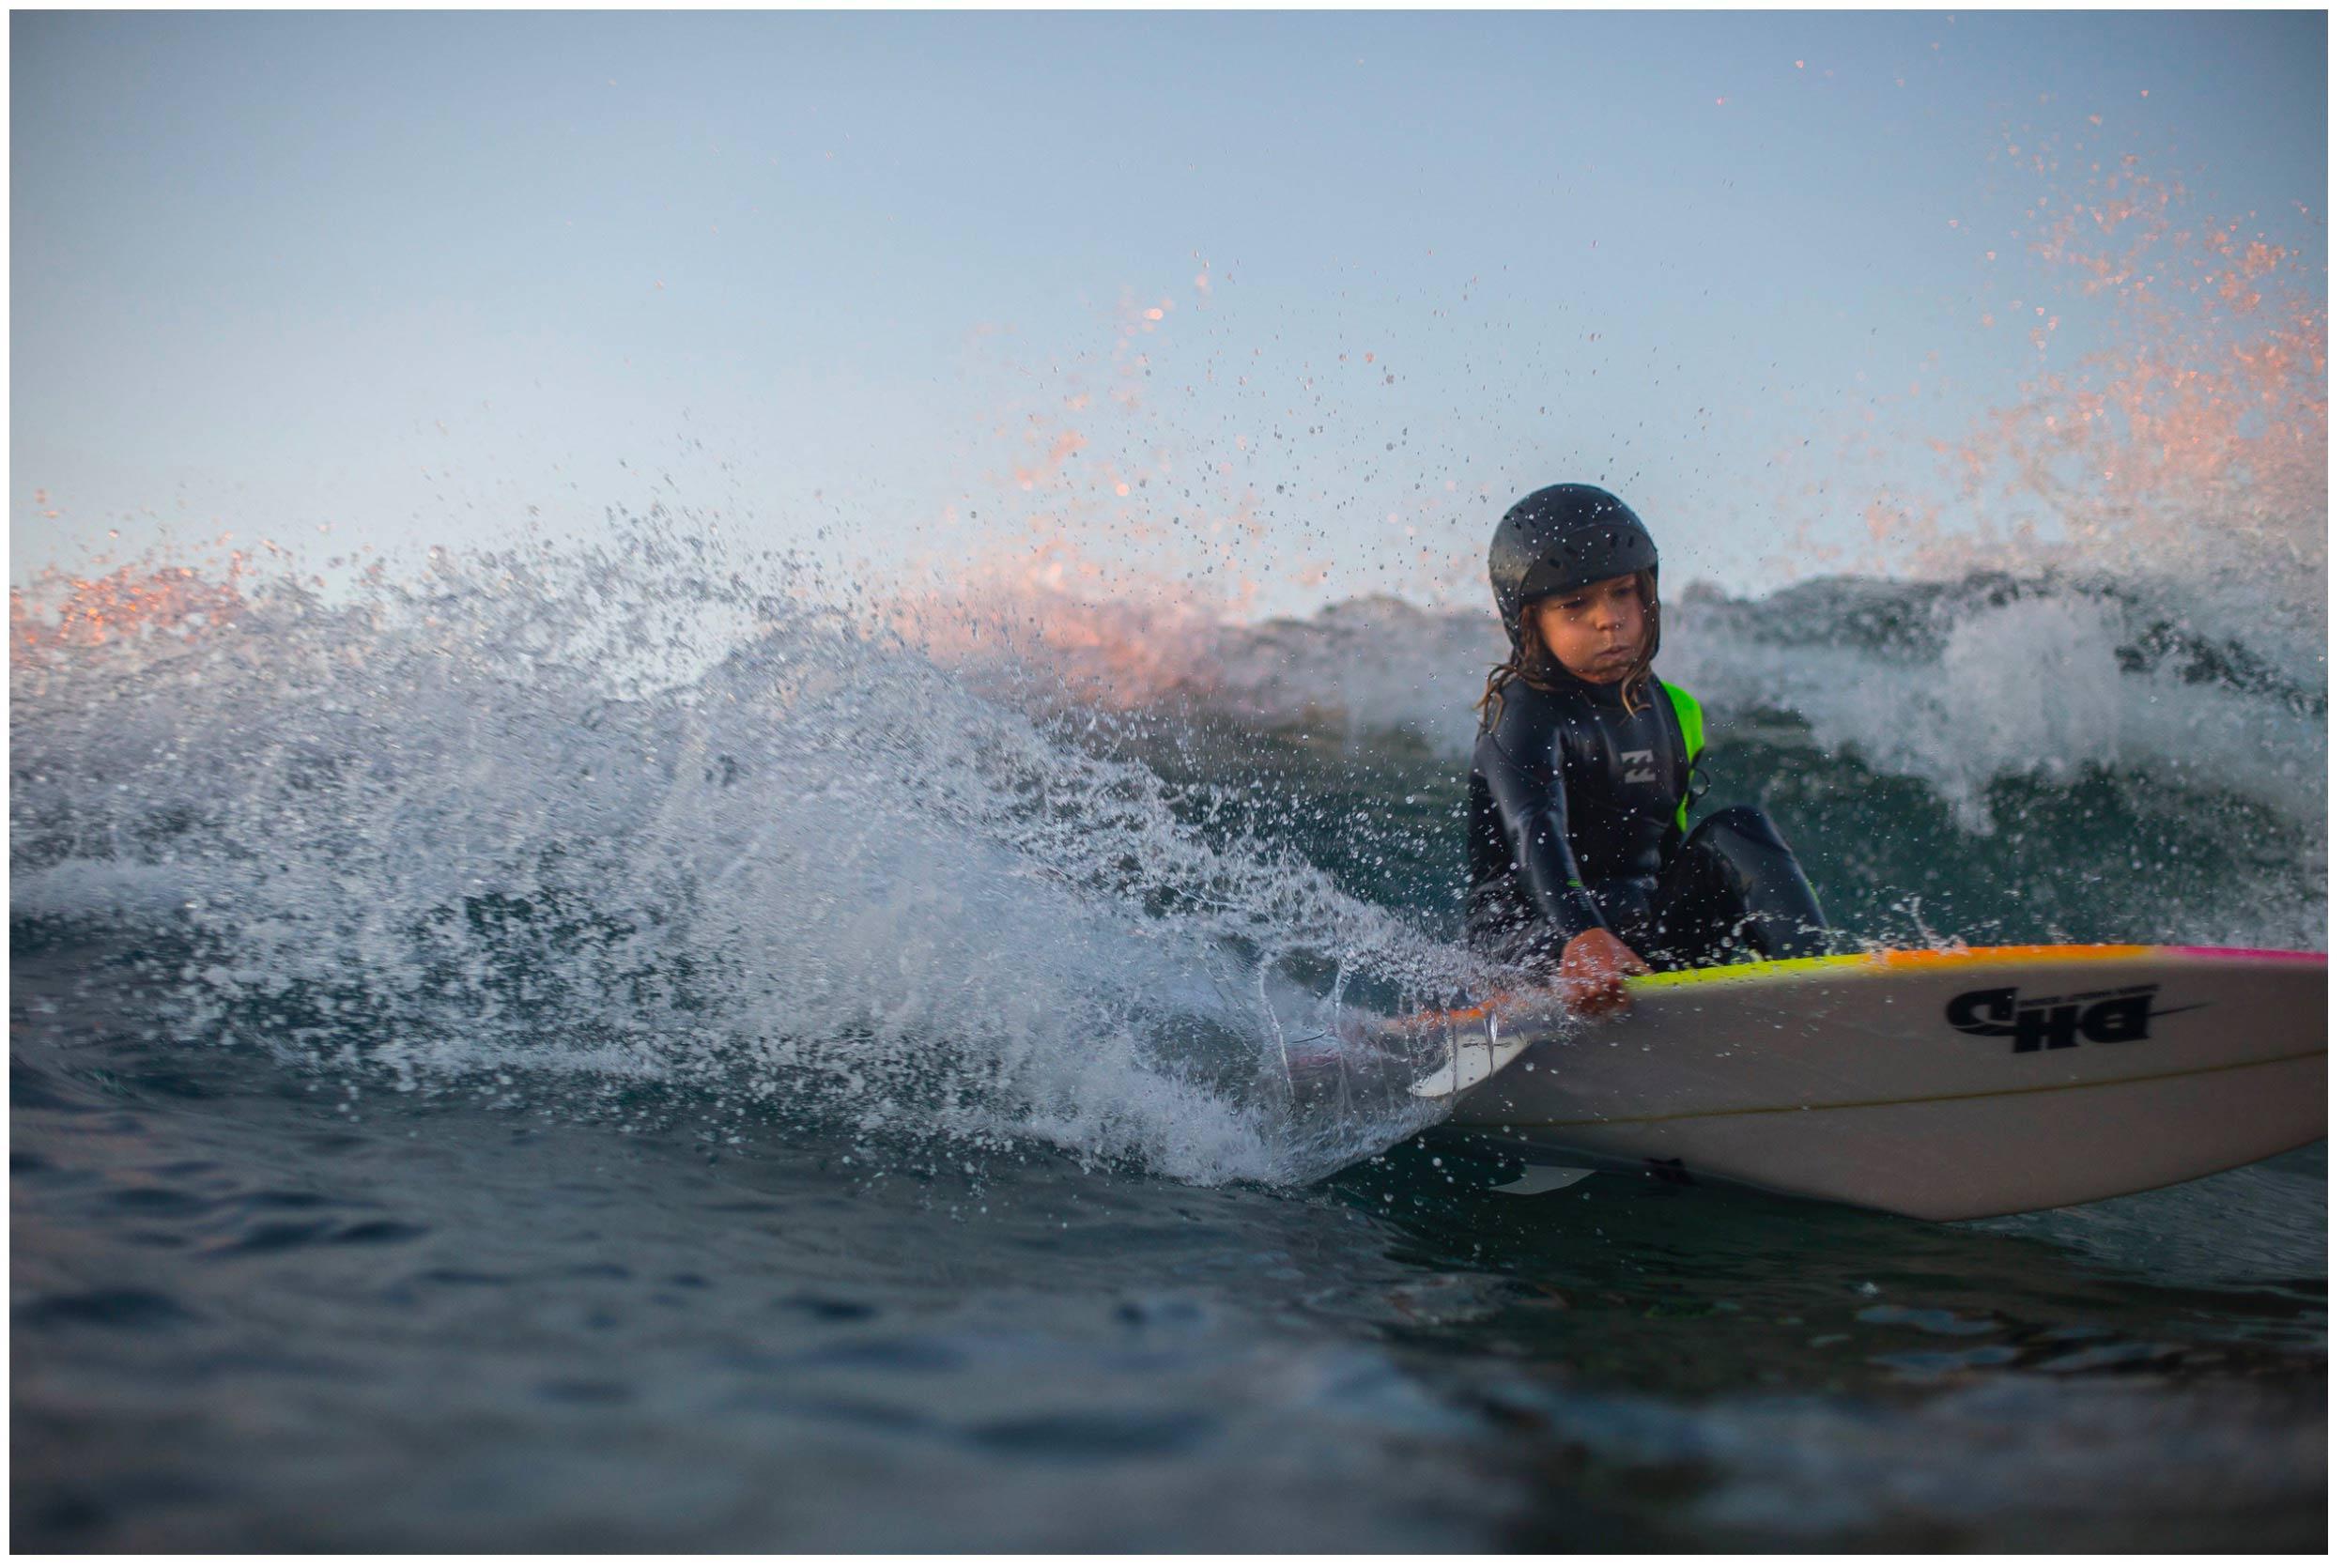 rodd-owen-surf-photography-for-sale-owenphoto-263.jpg